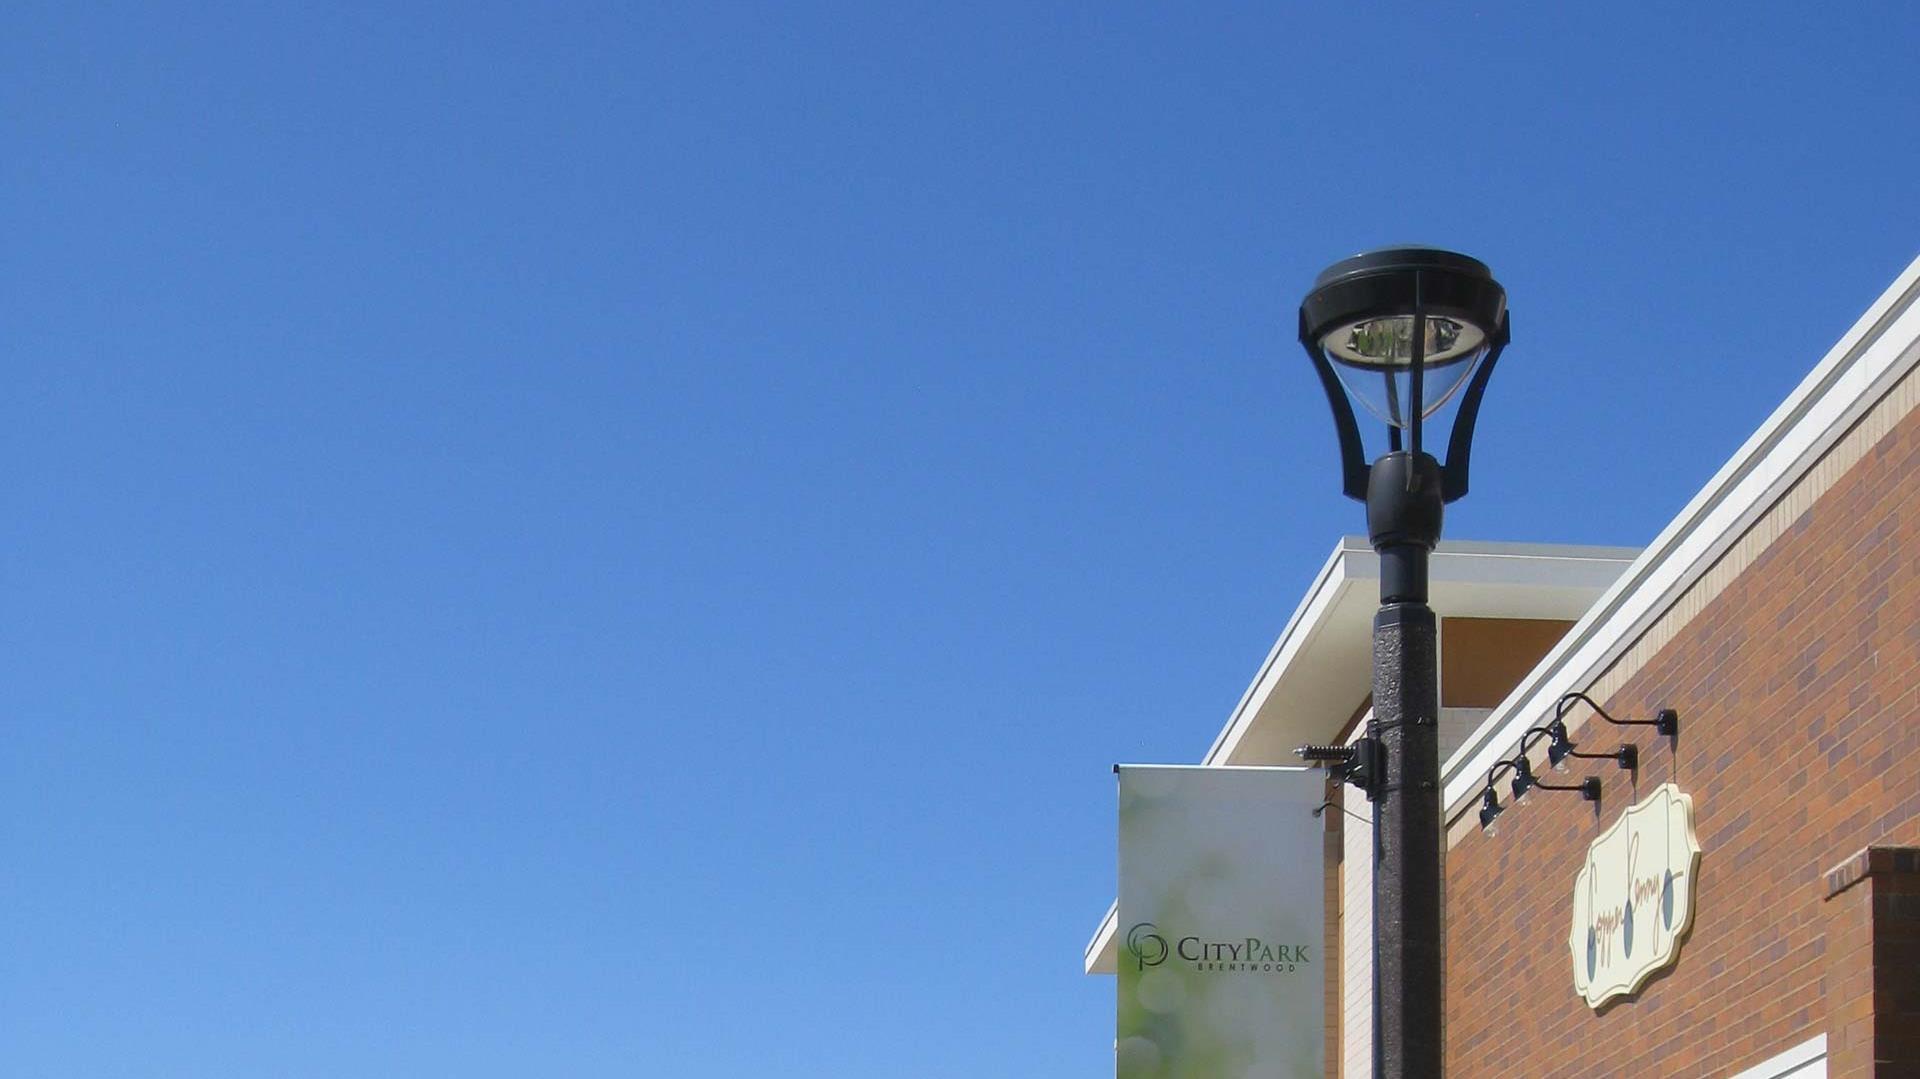 Victorian Series 8 Lighting Poles